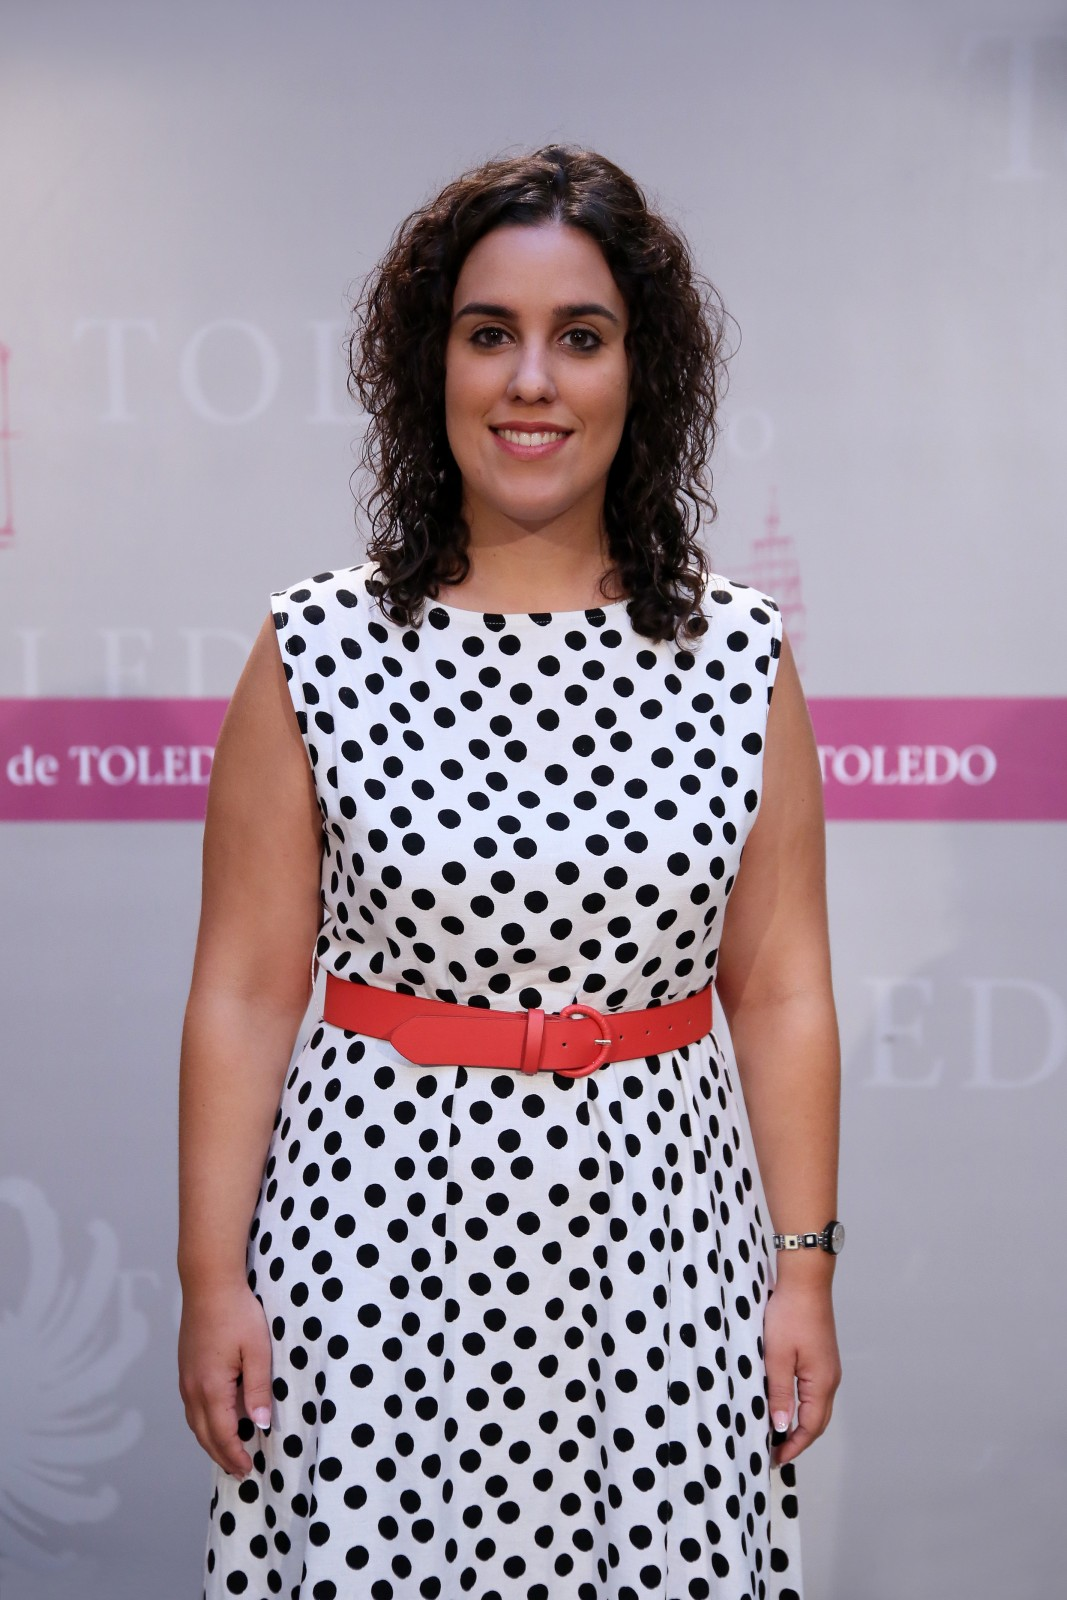 Inés Sandoval Tormo